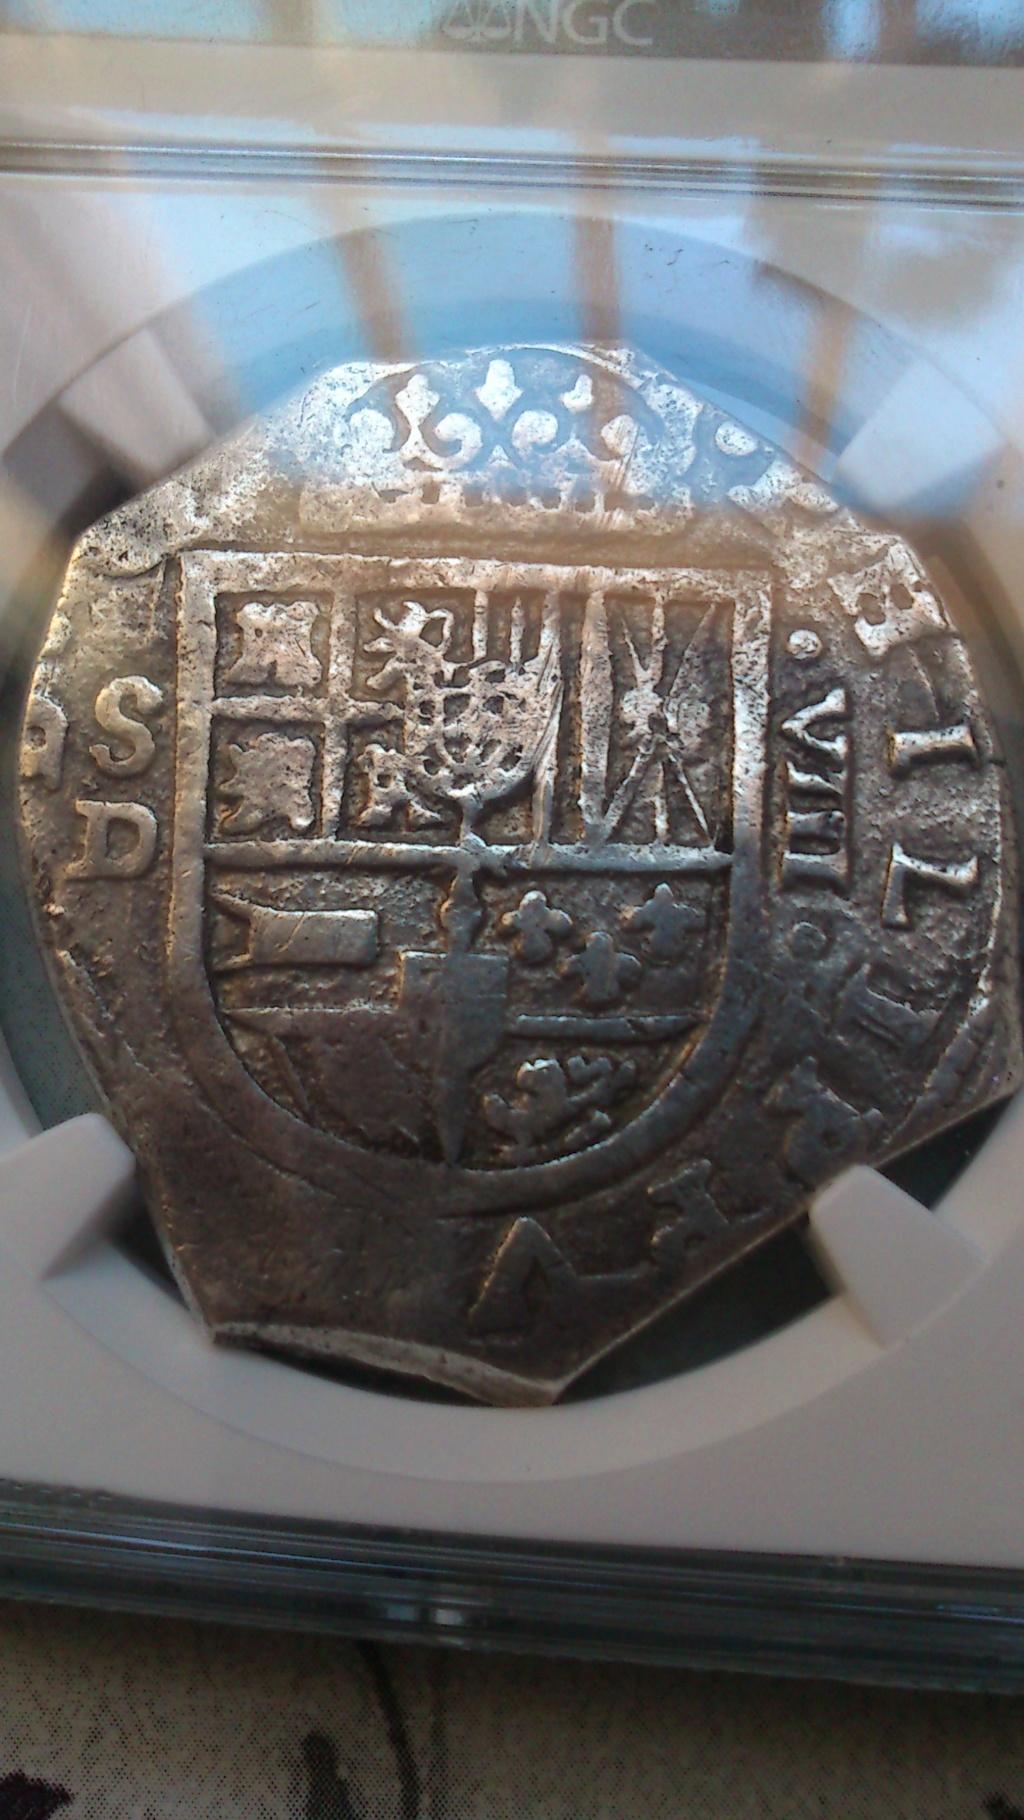 8 reales, Felipe IV ceca de Sevilla  1628 - Página 2 Dsc_0020